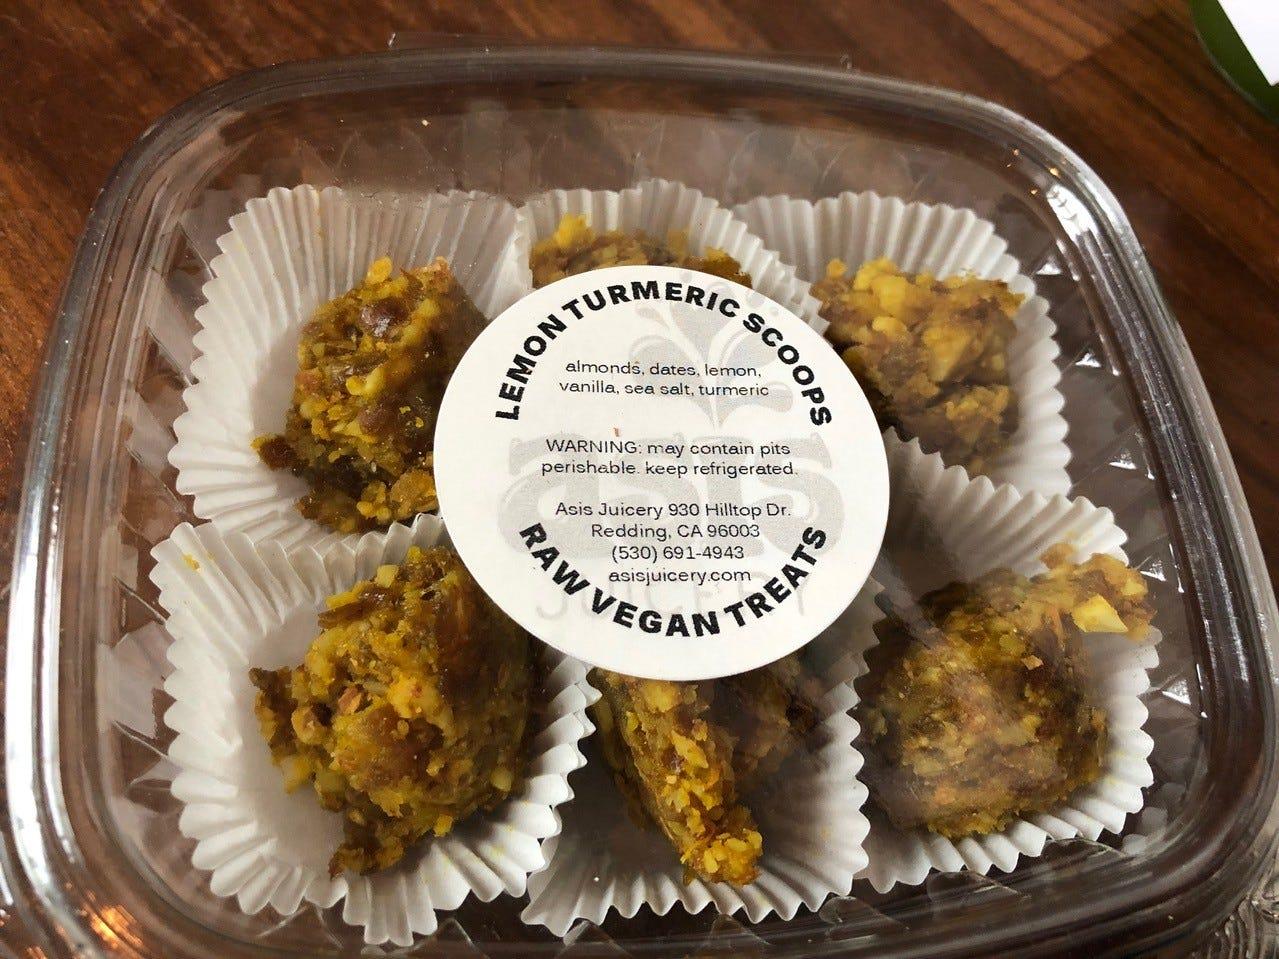 Lemon turmeric scoops at Asis Juicery.